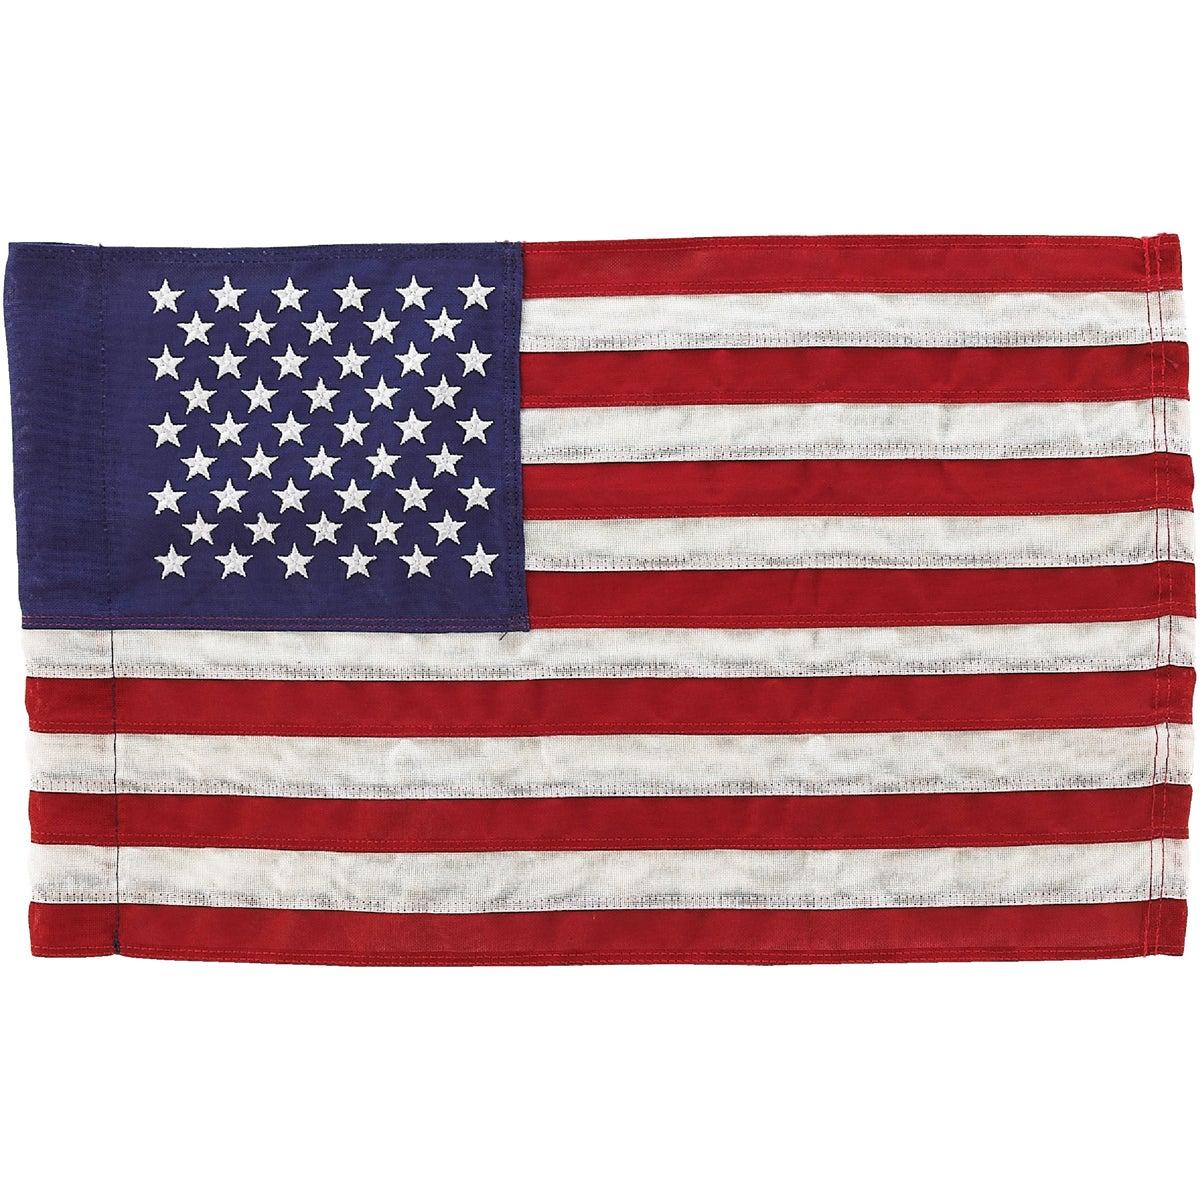 12X18 U.S. GARDEN FLAG